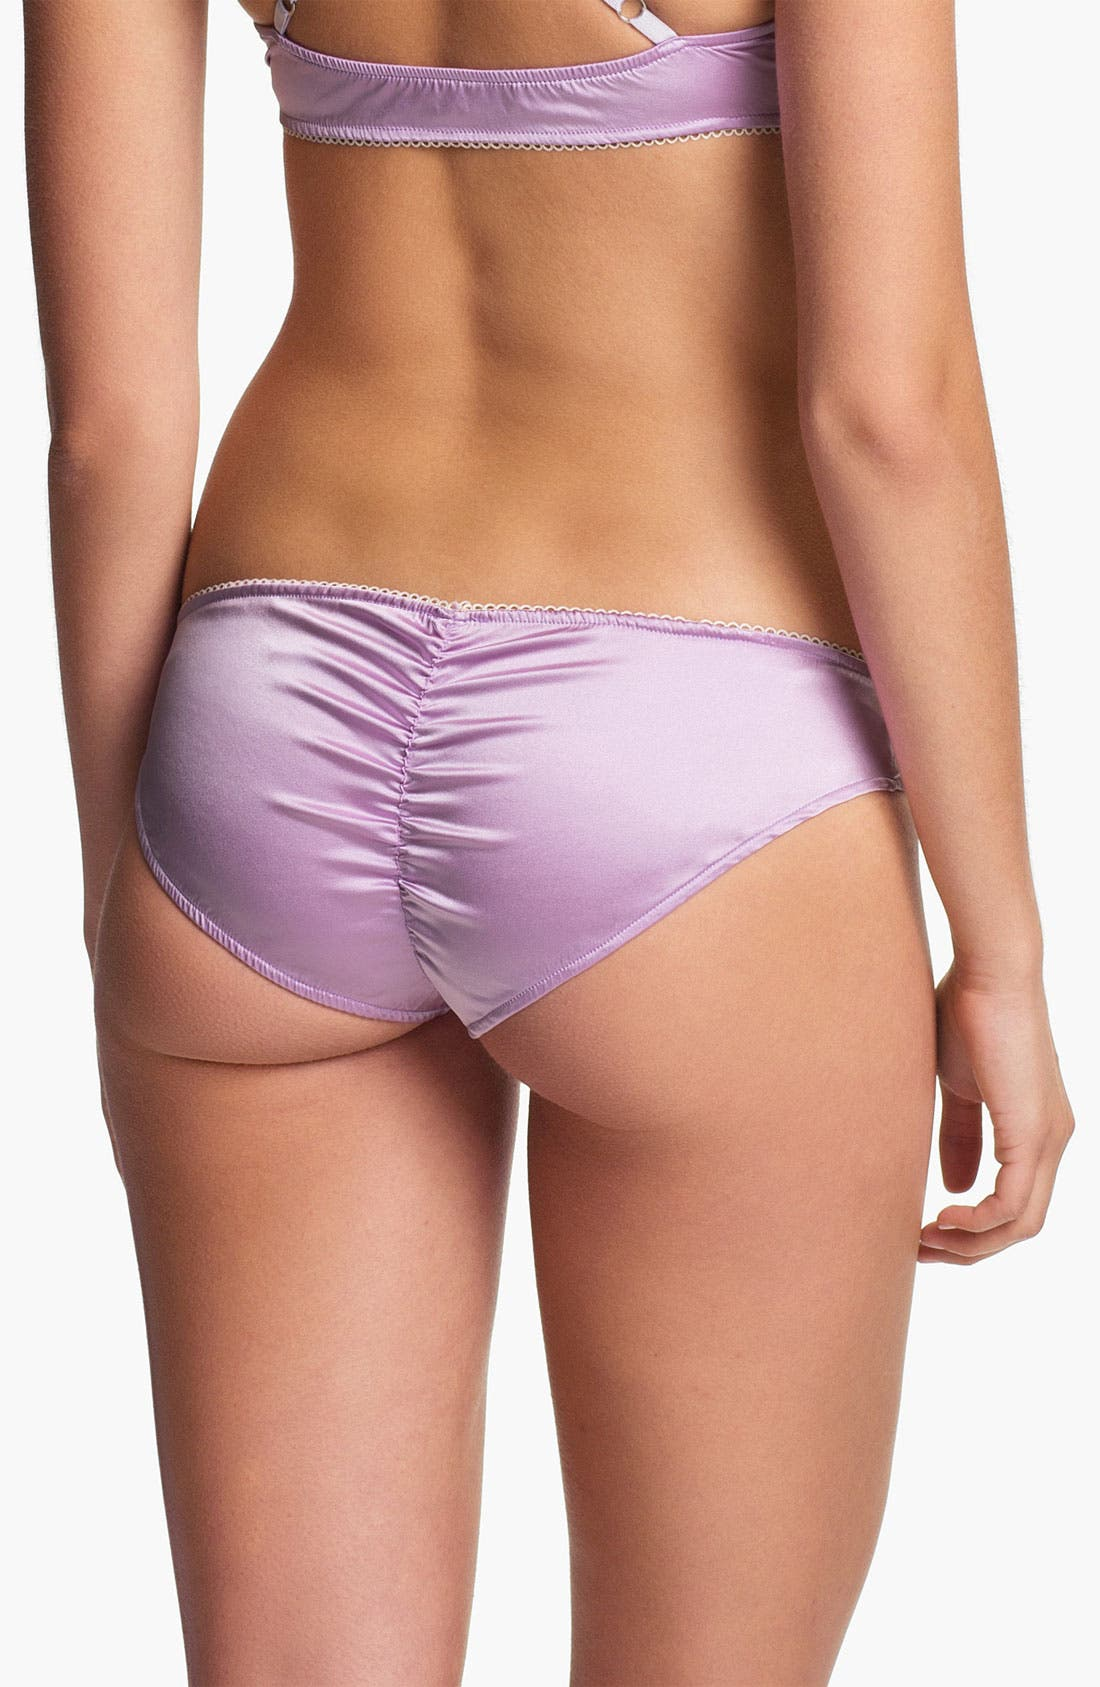 Alternate Image 2  - Zinke 'Lillie' Panty